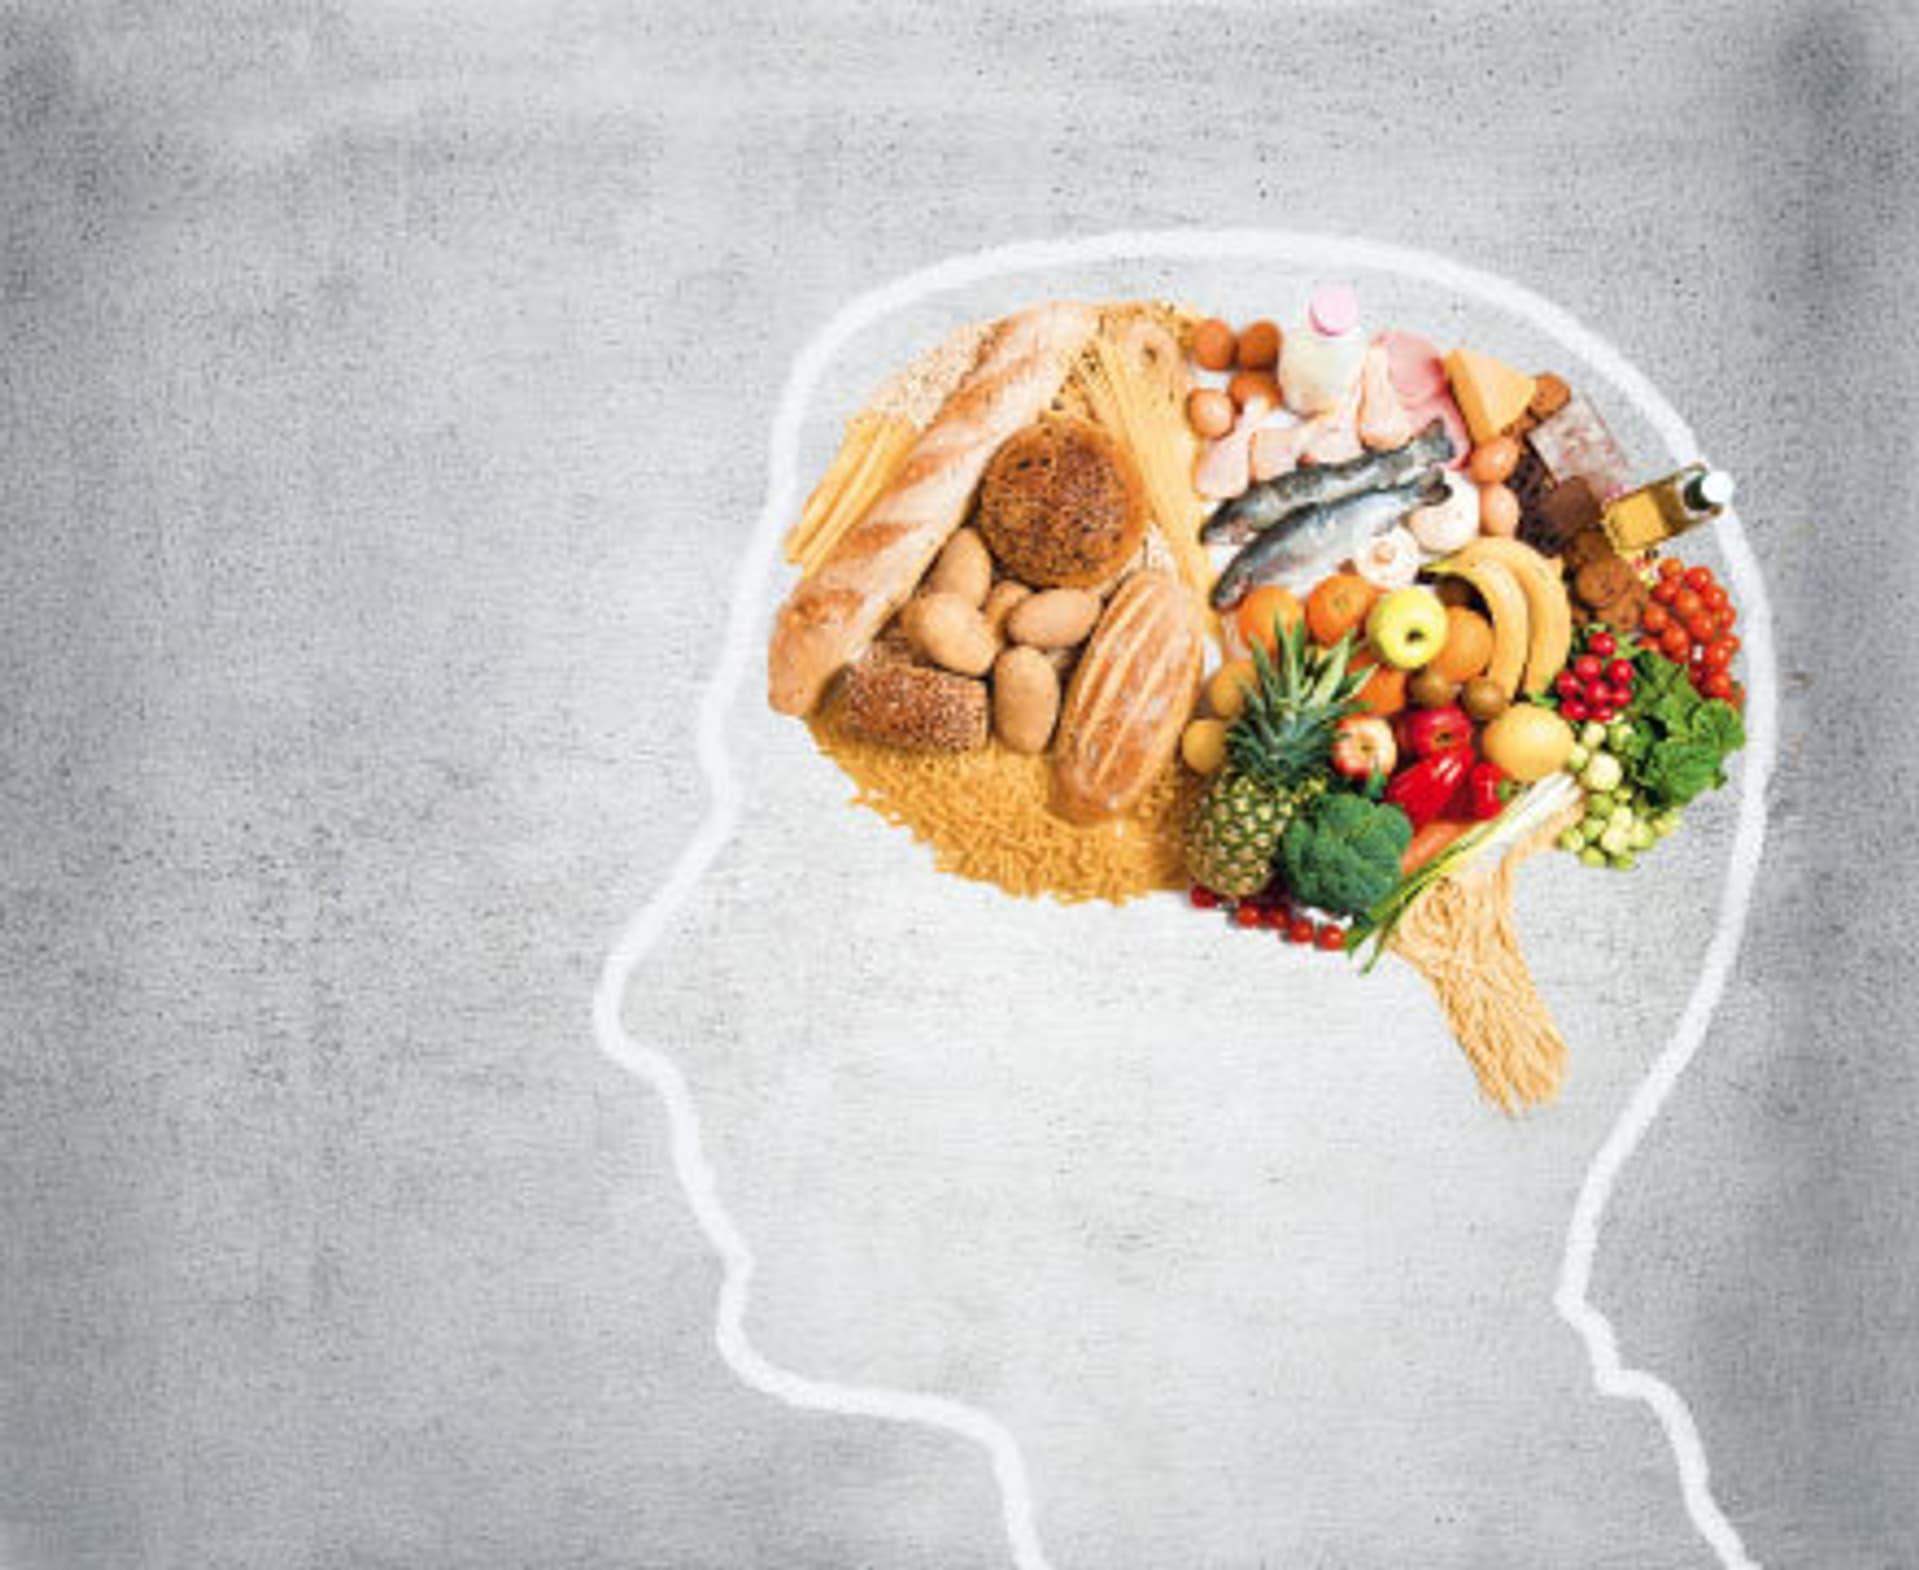 Orthorexie, Frau isst Salat (Foto: Fotolia.com)